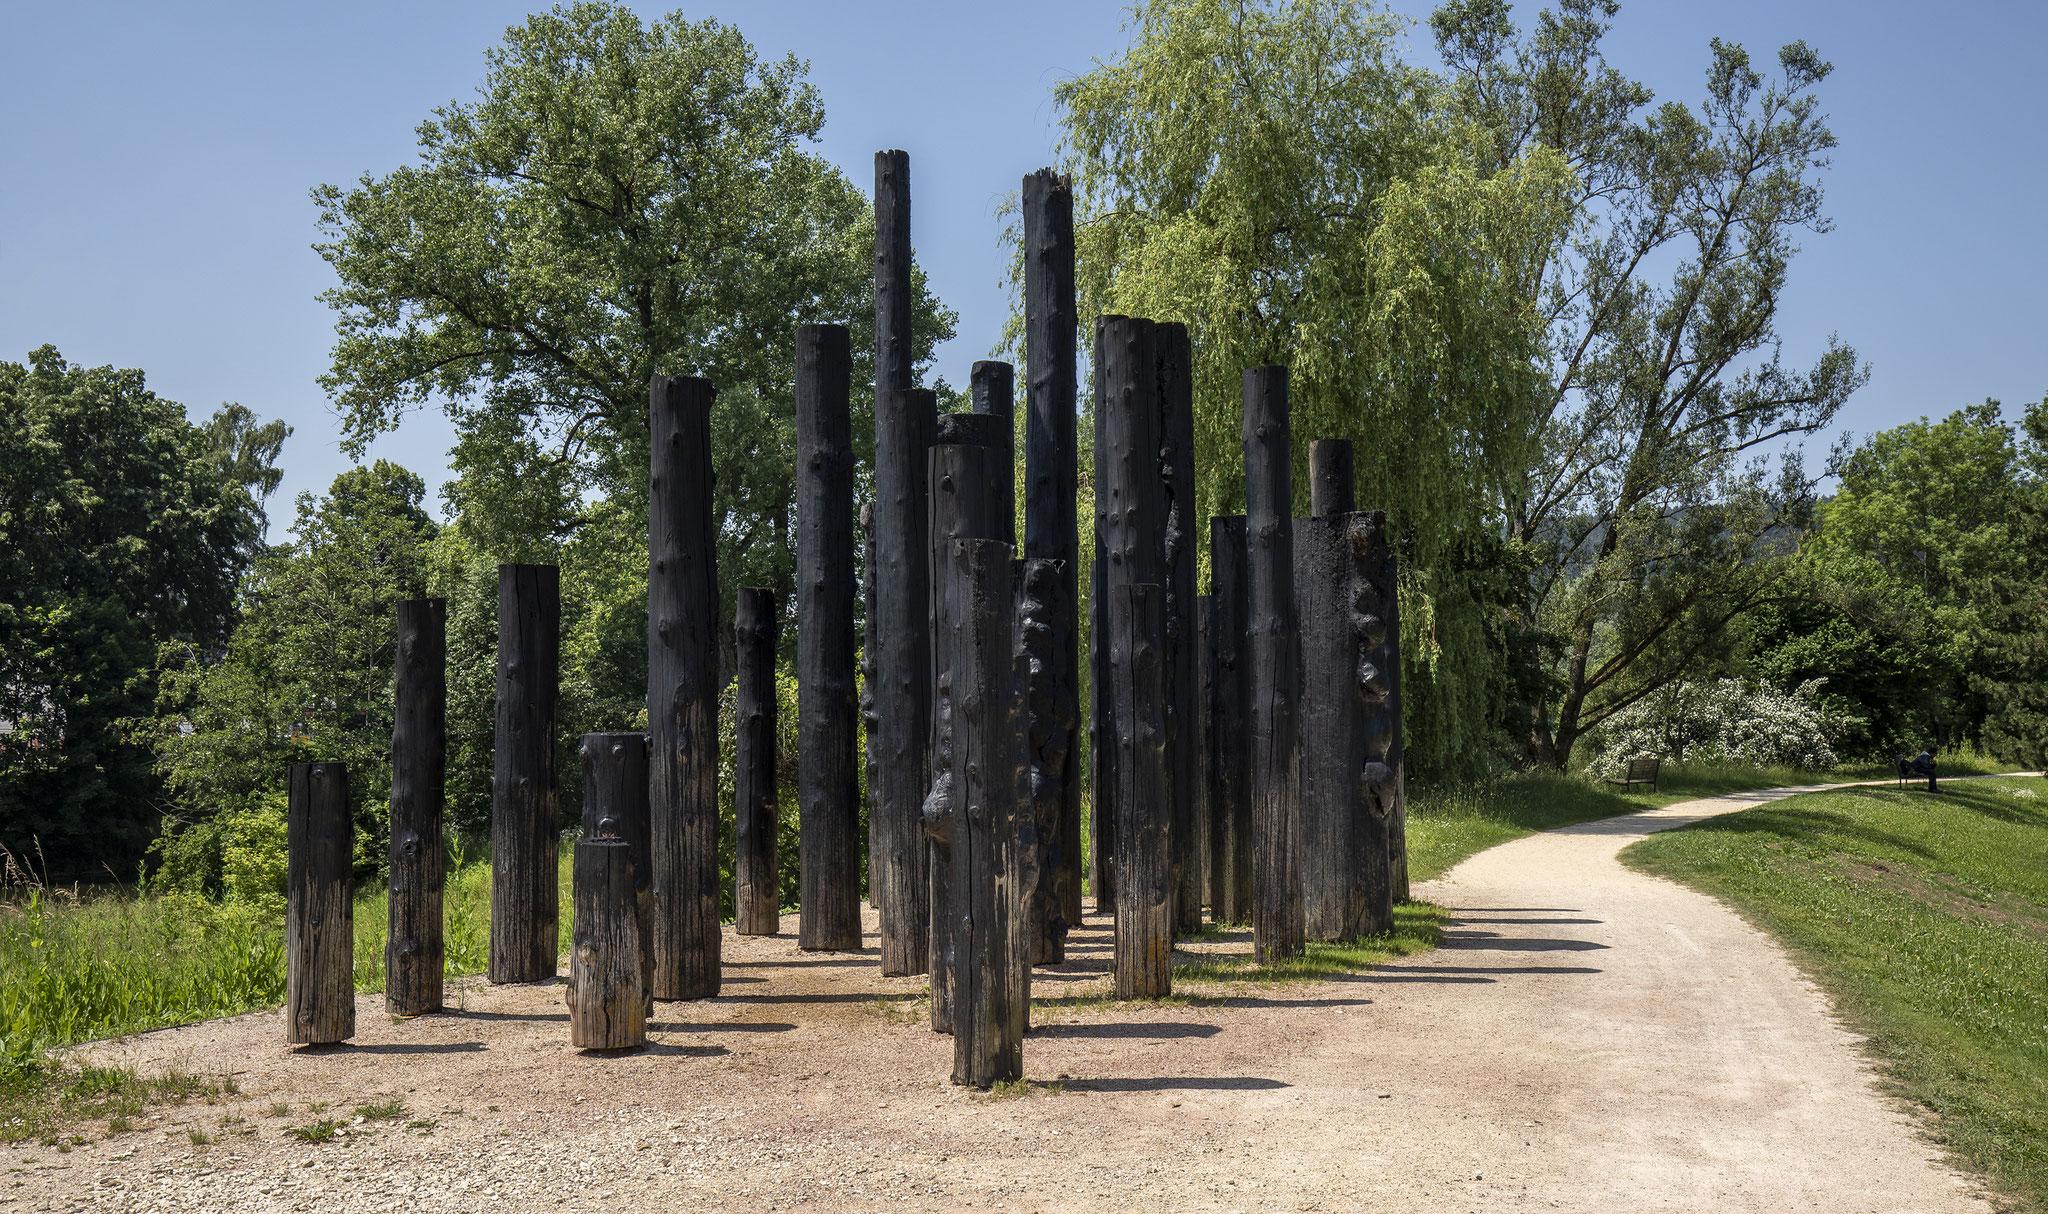 JOHANNES PFEIFFER Metamorphose, 2003 - 2019, Holzstämme, Bitumen